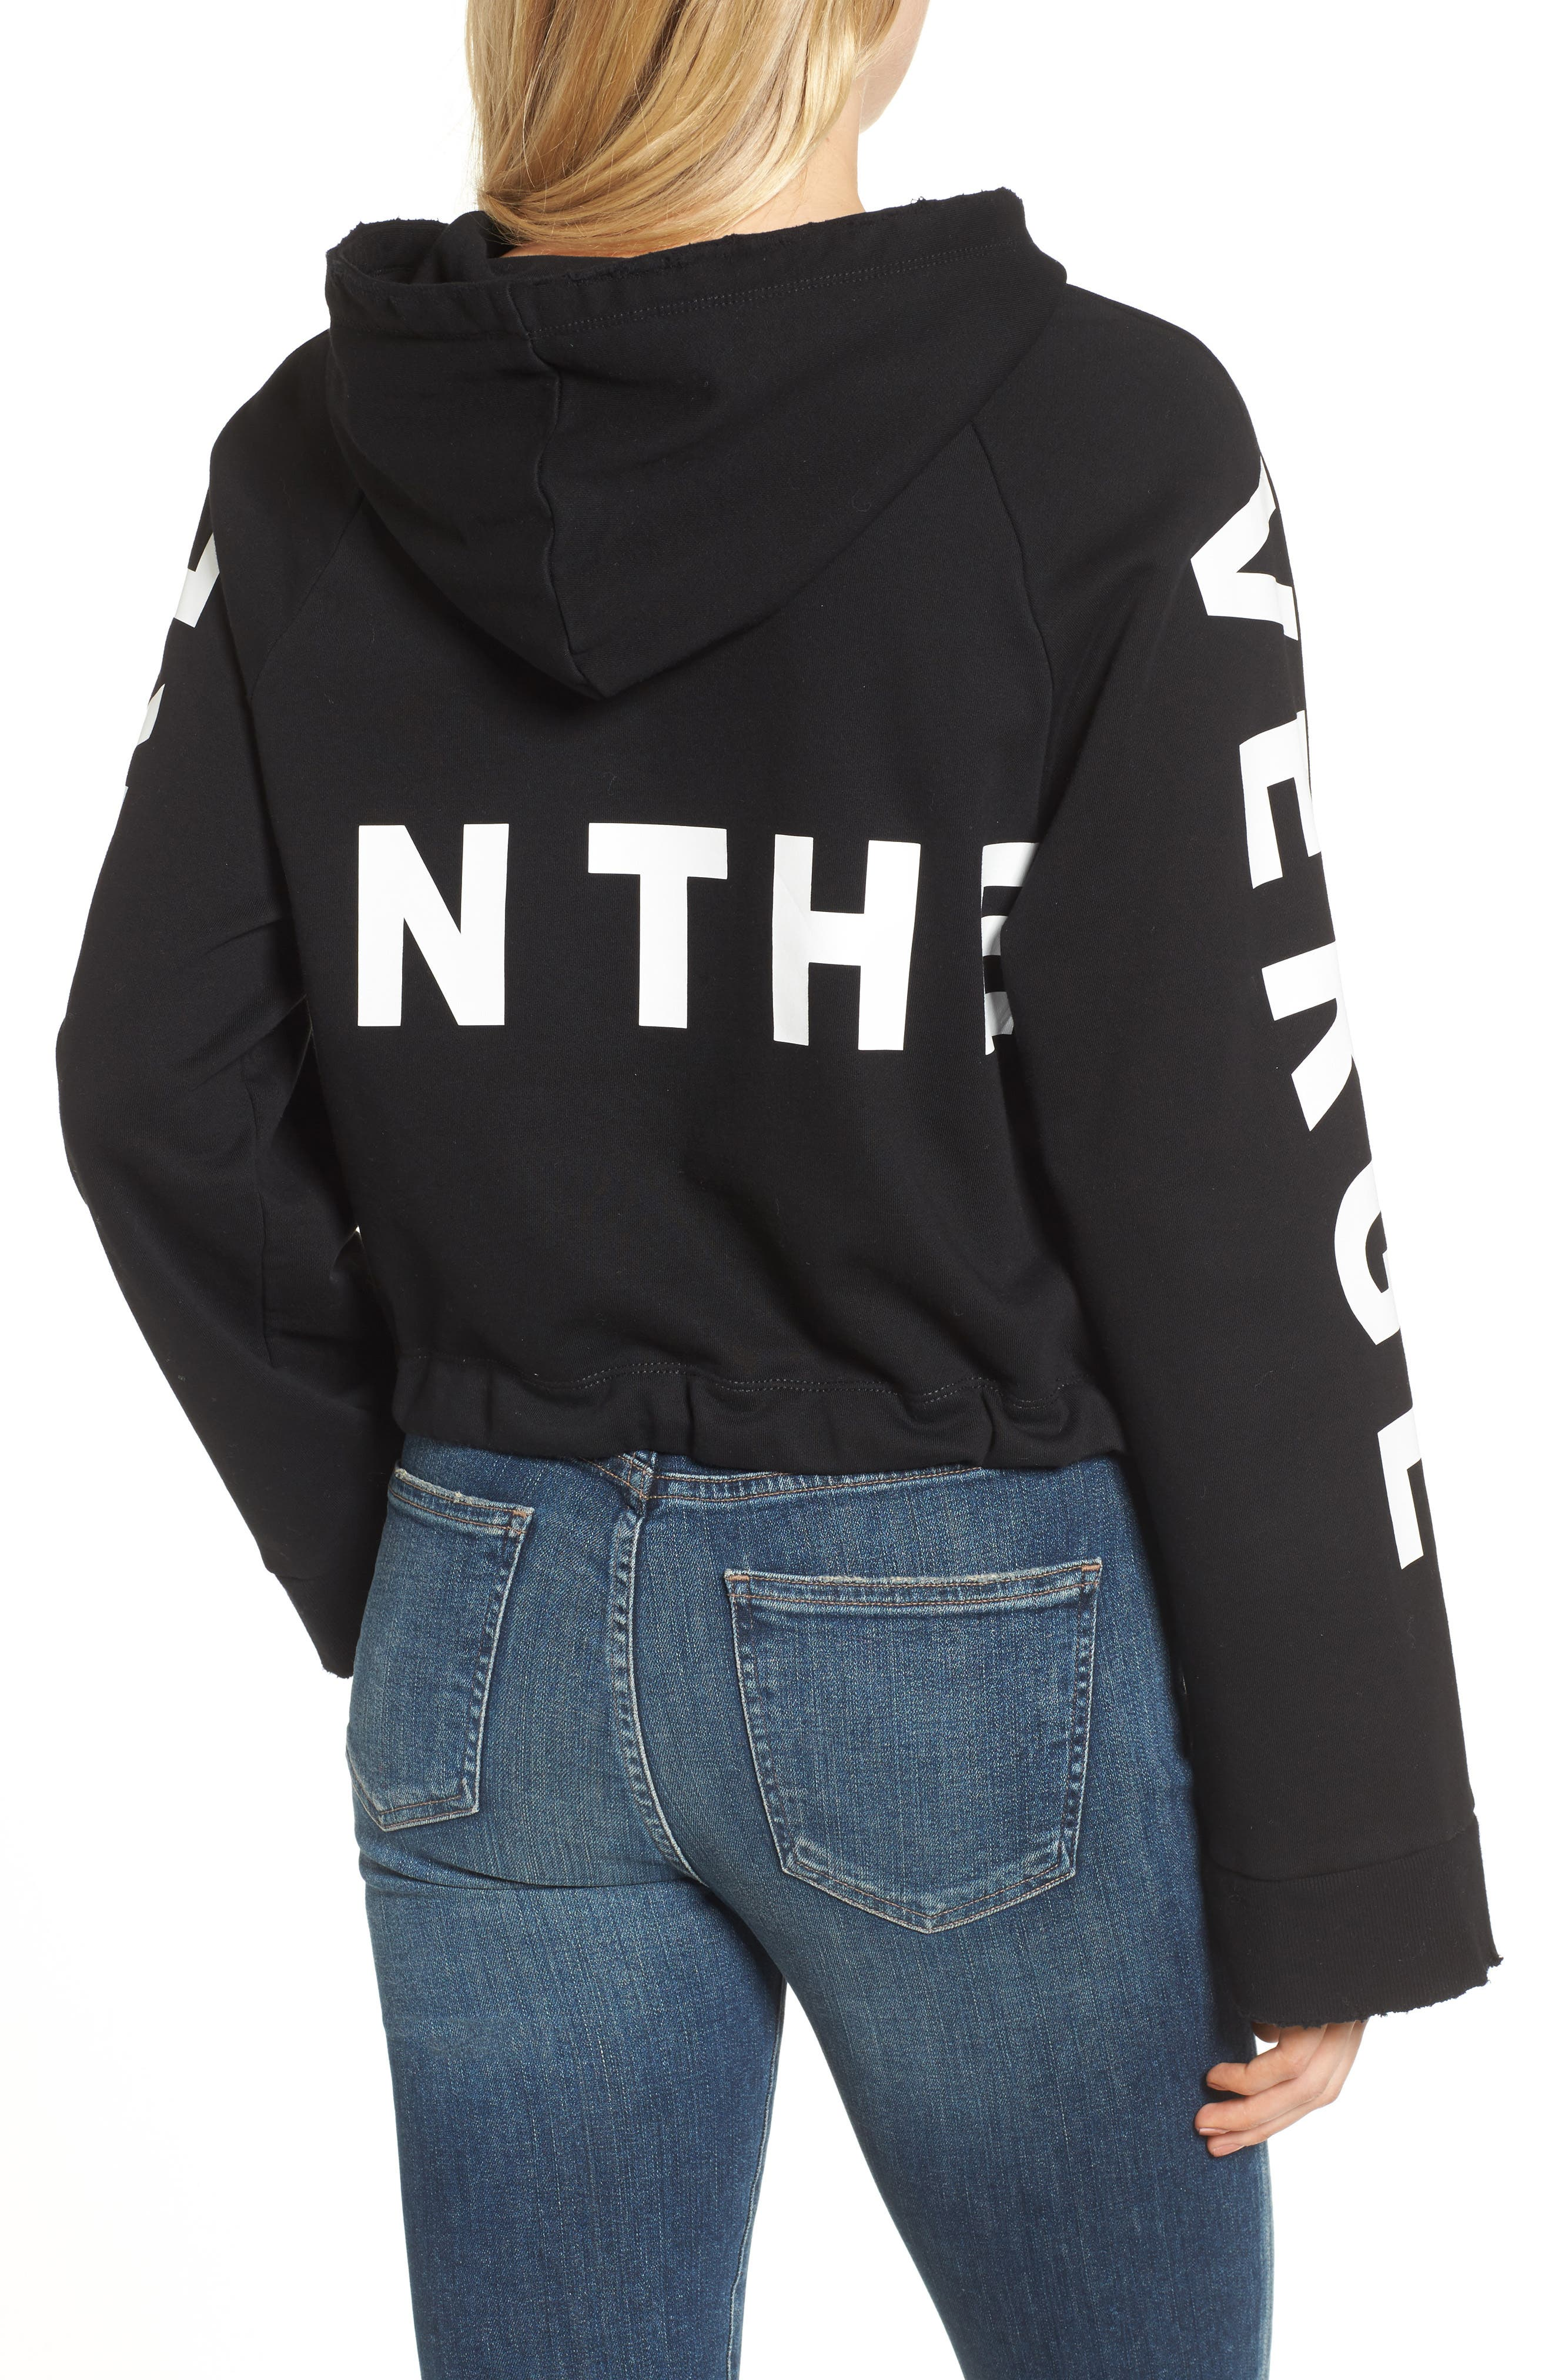 Girl on the Verge Crop Sweatshirt,                             Alternate thumbnail 2, color,                             Black